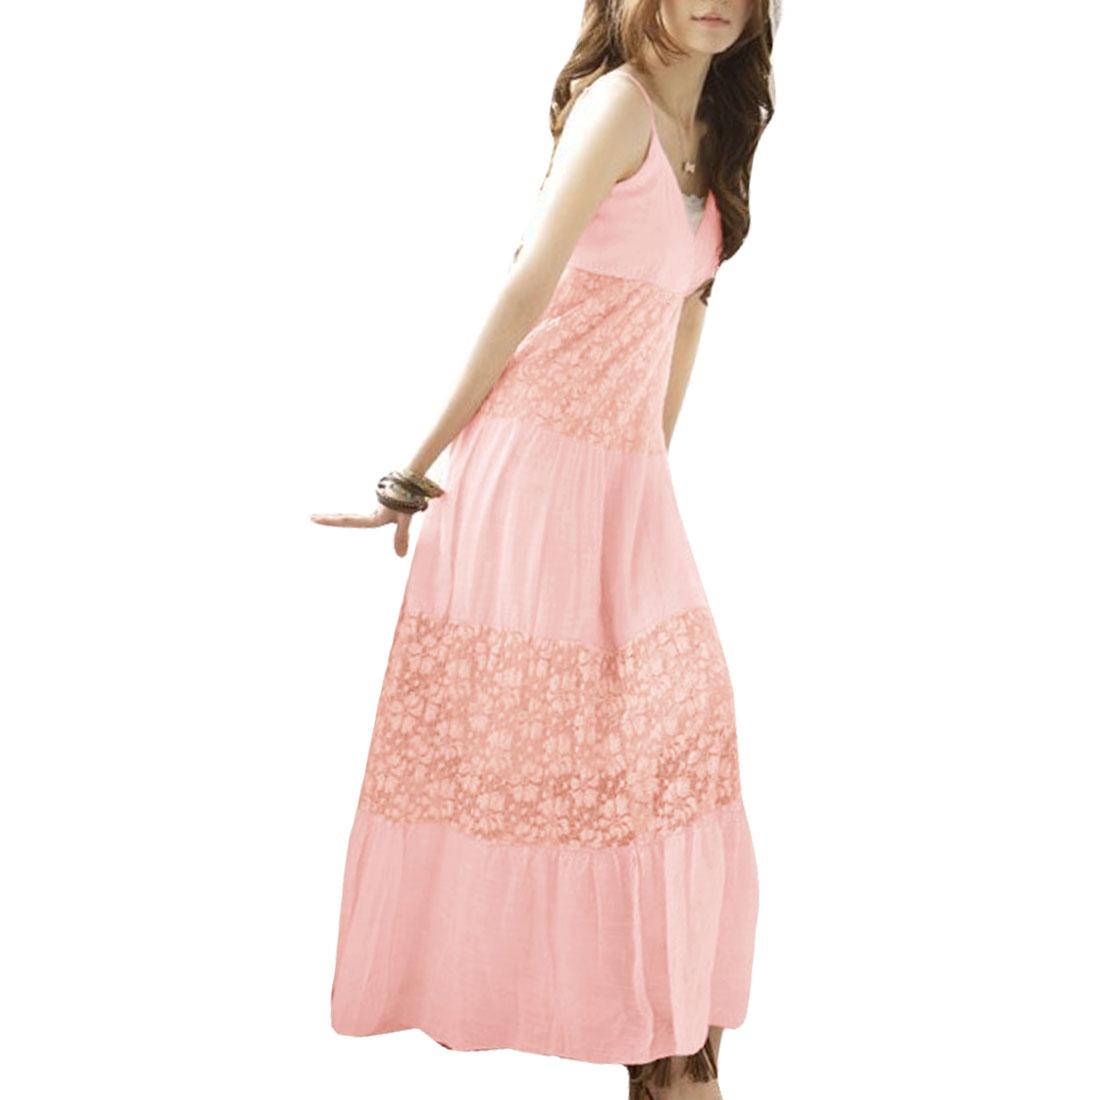 Ladies Spaghetti Strap Sleeveless Empire Elegant Dress Pink XS